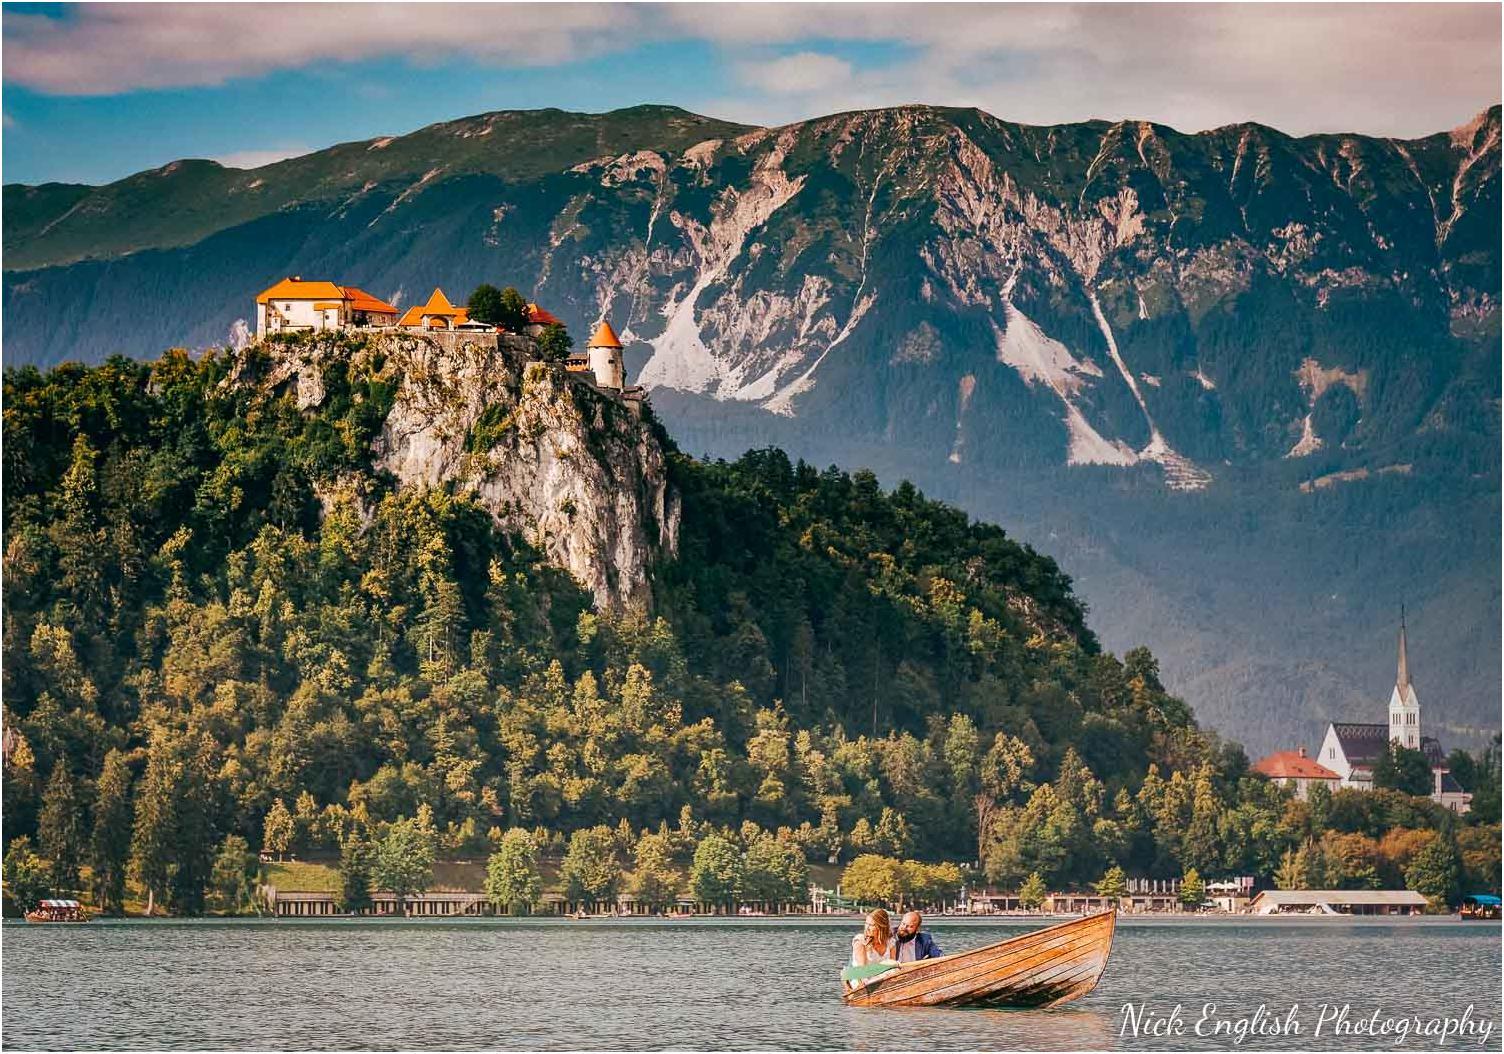 Destination_Wedding_Photographer_Slovenia_Nick_English_Photography-70-6.jpg